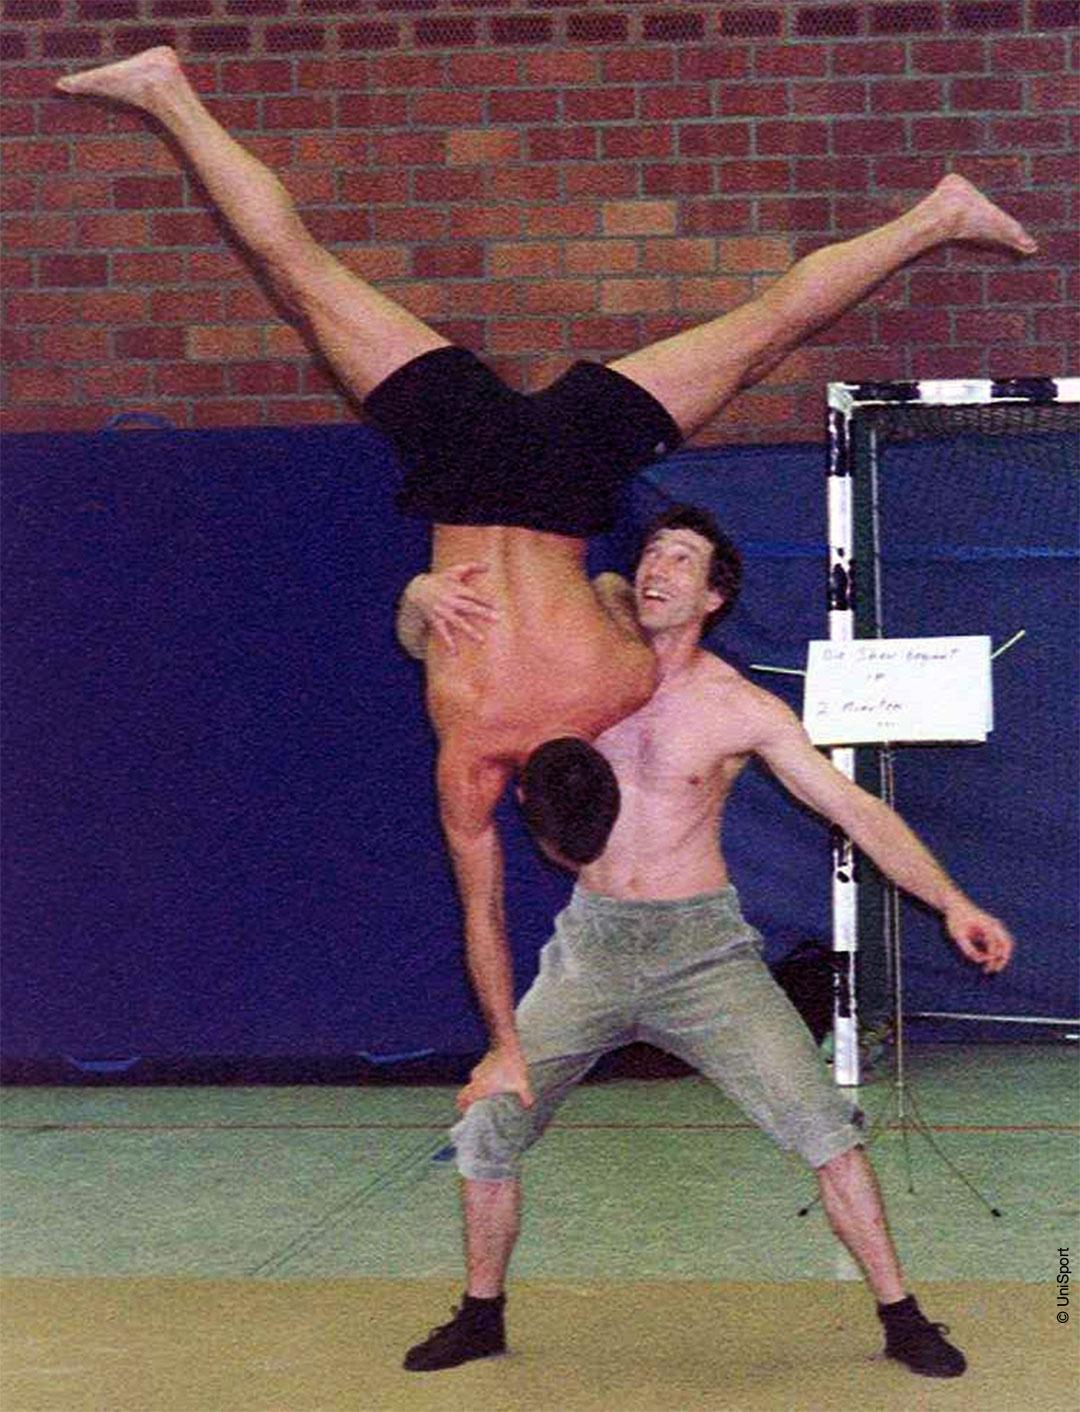 Zweit akrobatik bilder zu Yoga Poses